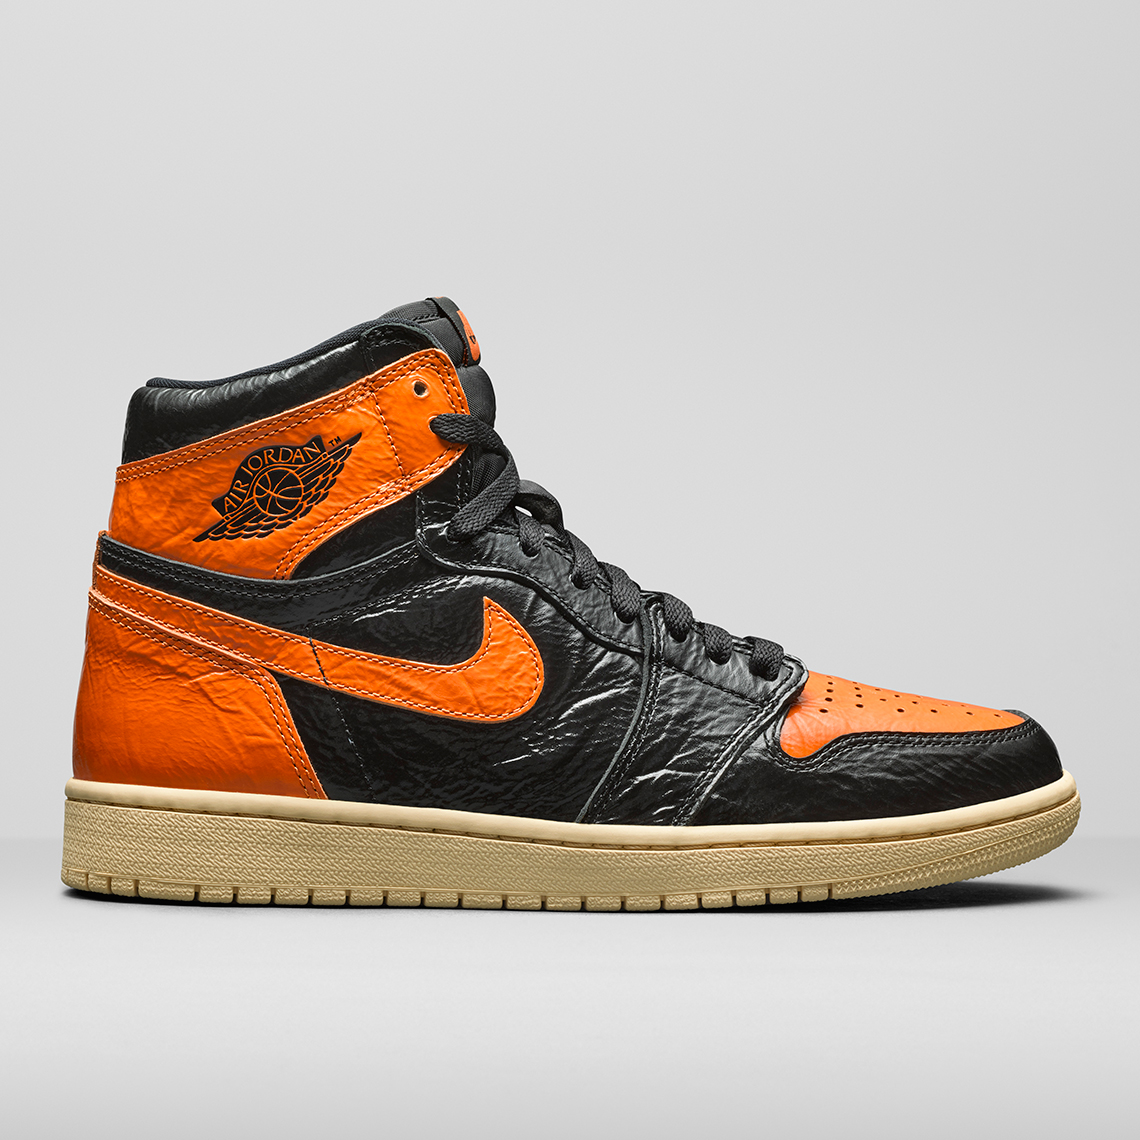 jordan-1-fearless-sbb-black-orange